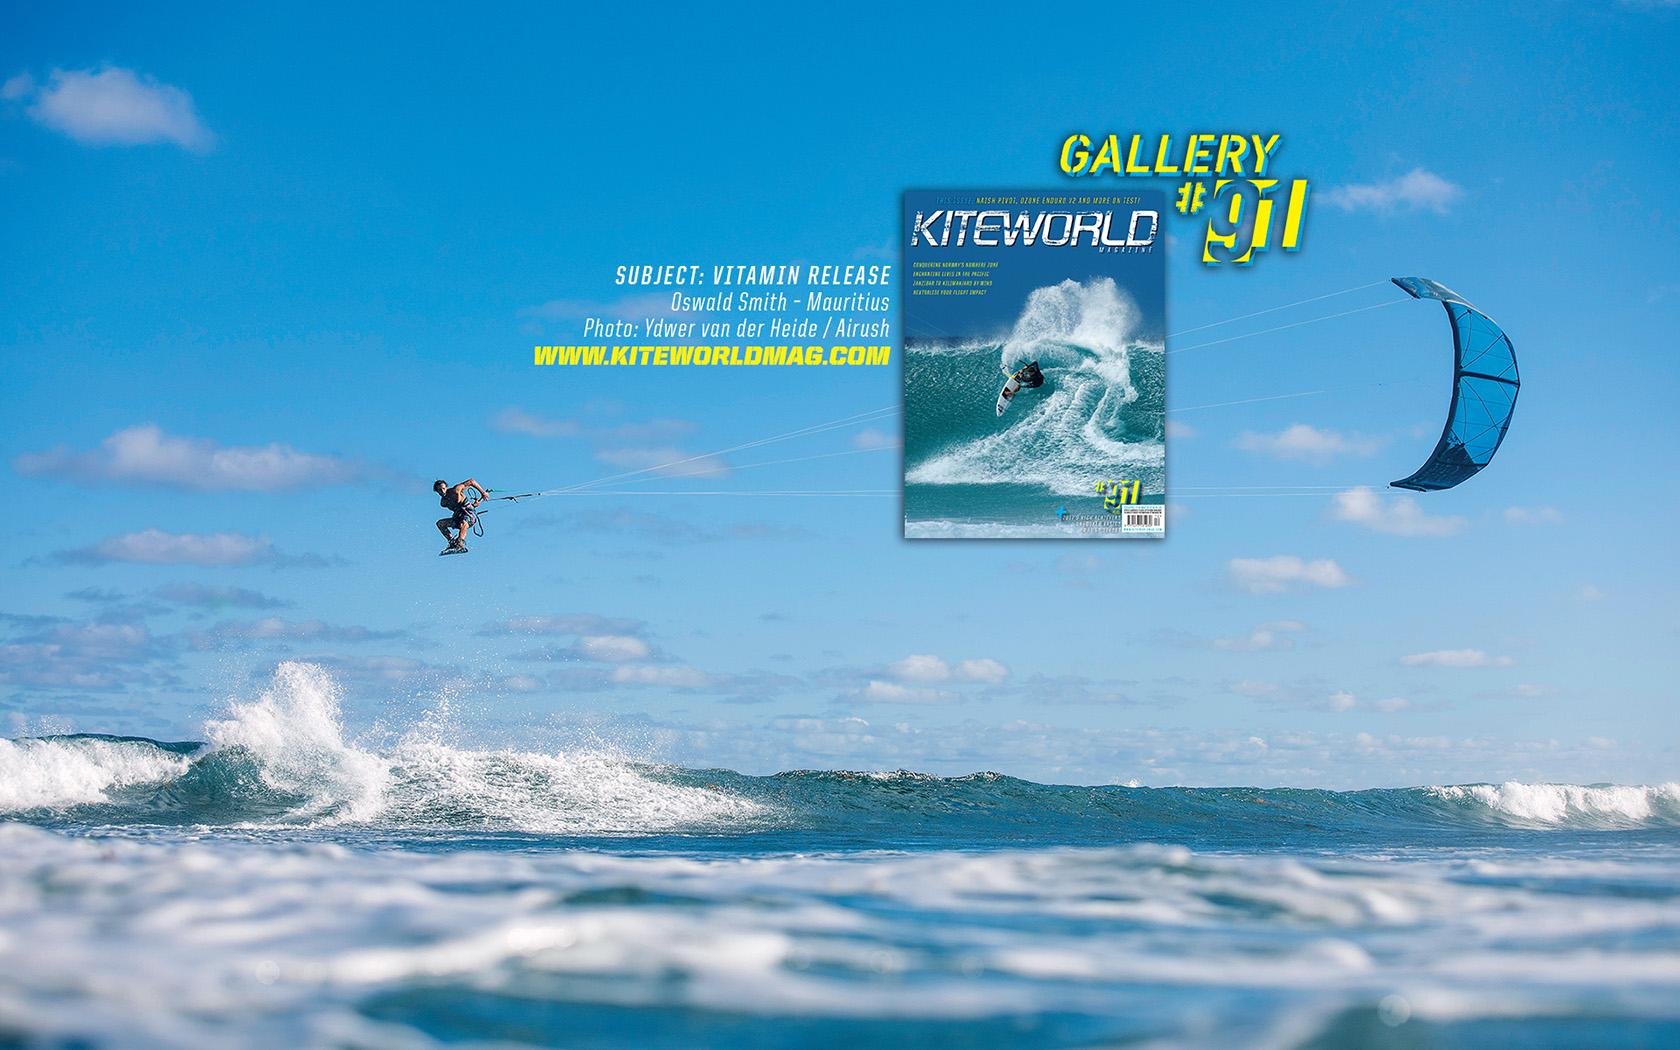 Oswald Smith, Mauritius - Kiteworld issue 91 gallery